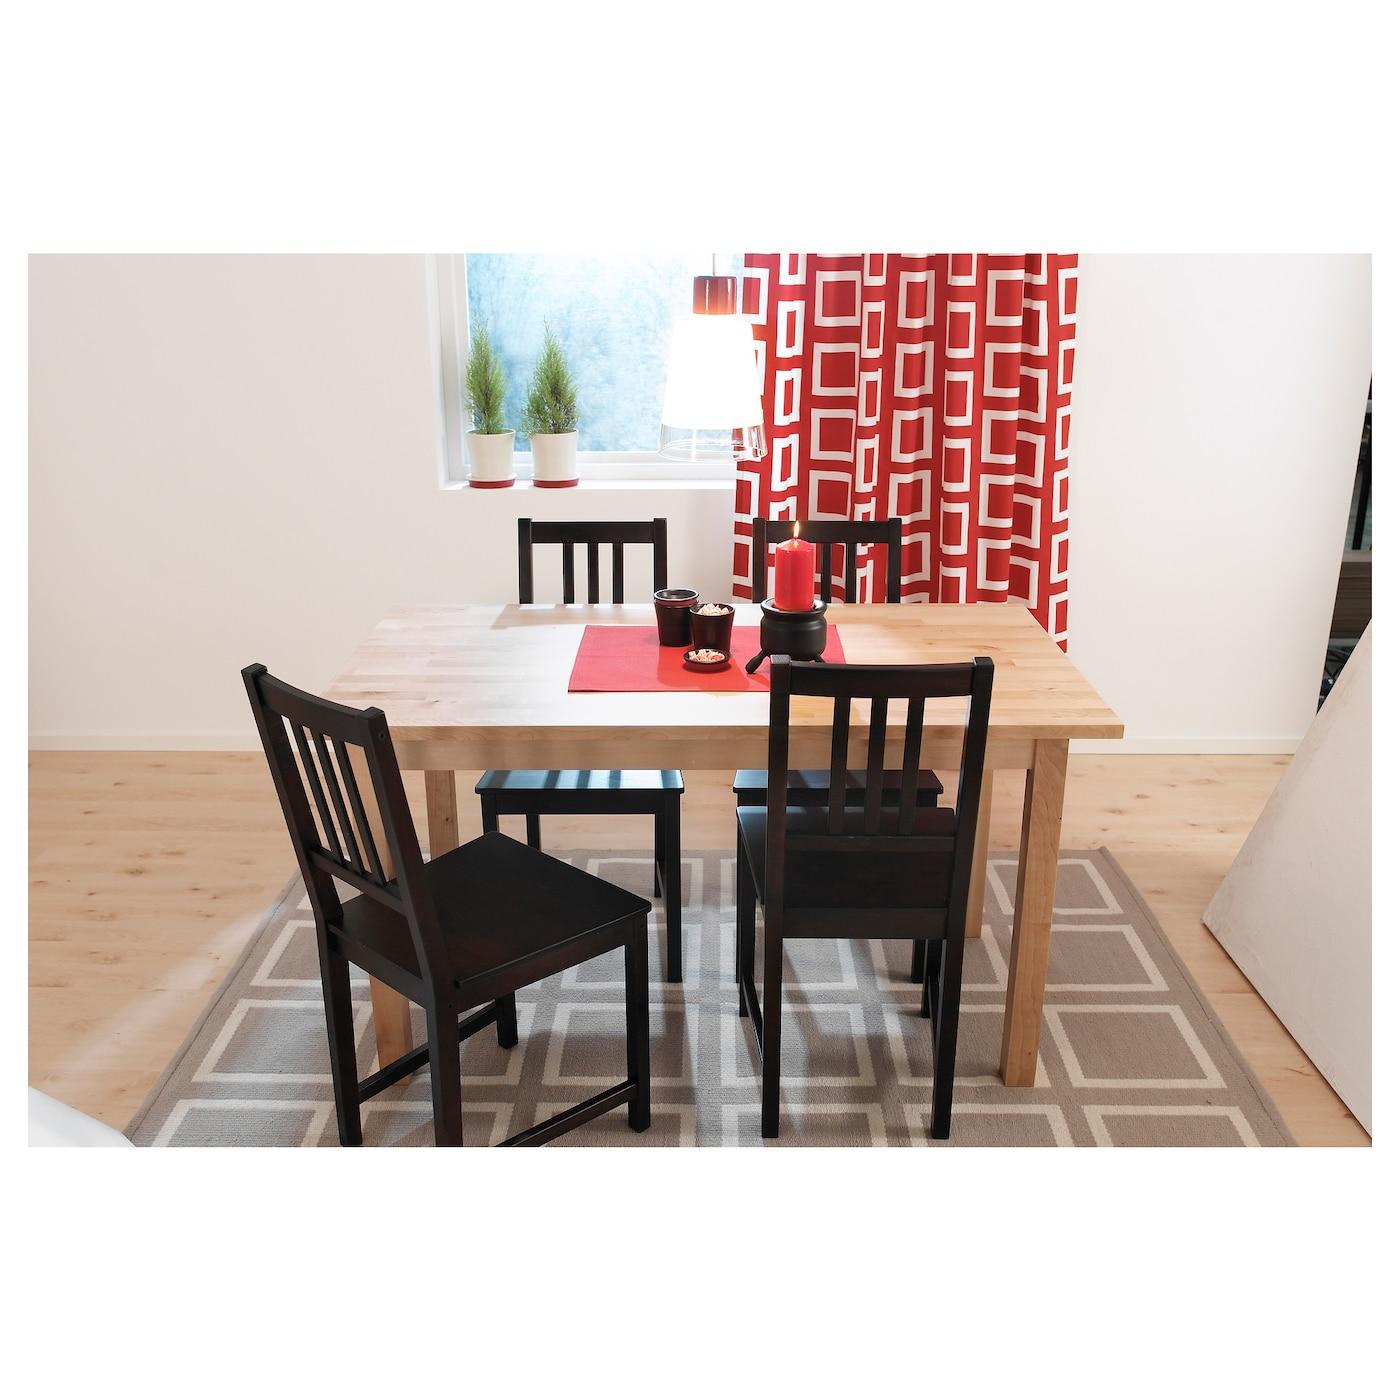 stefan chair brown black ikea. Black Bedroom Furniture Sets. Home Design Ideas